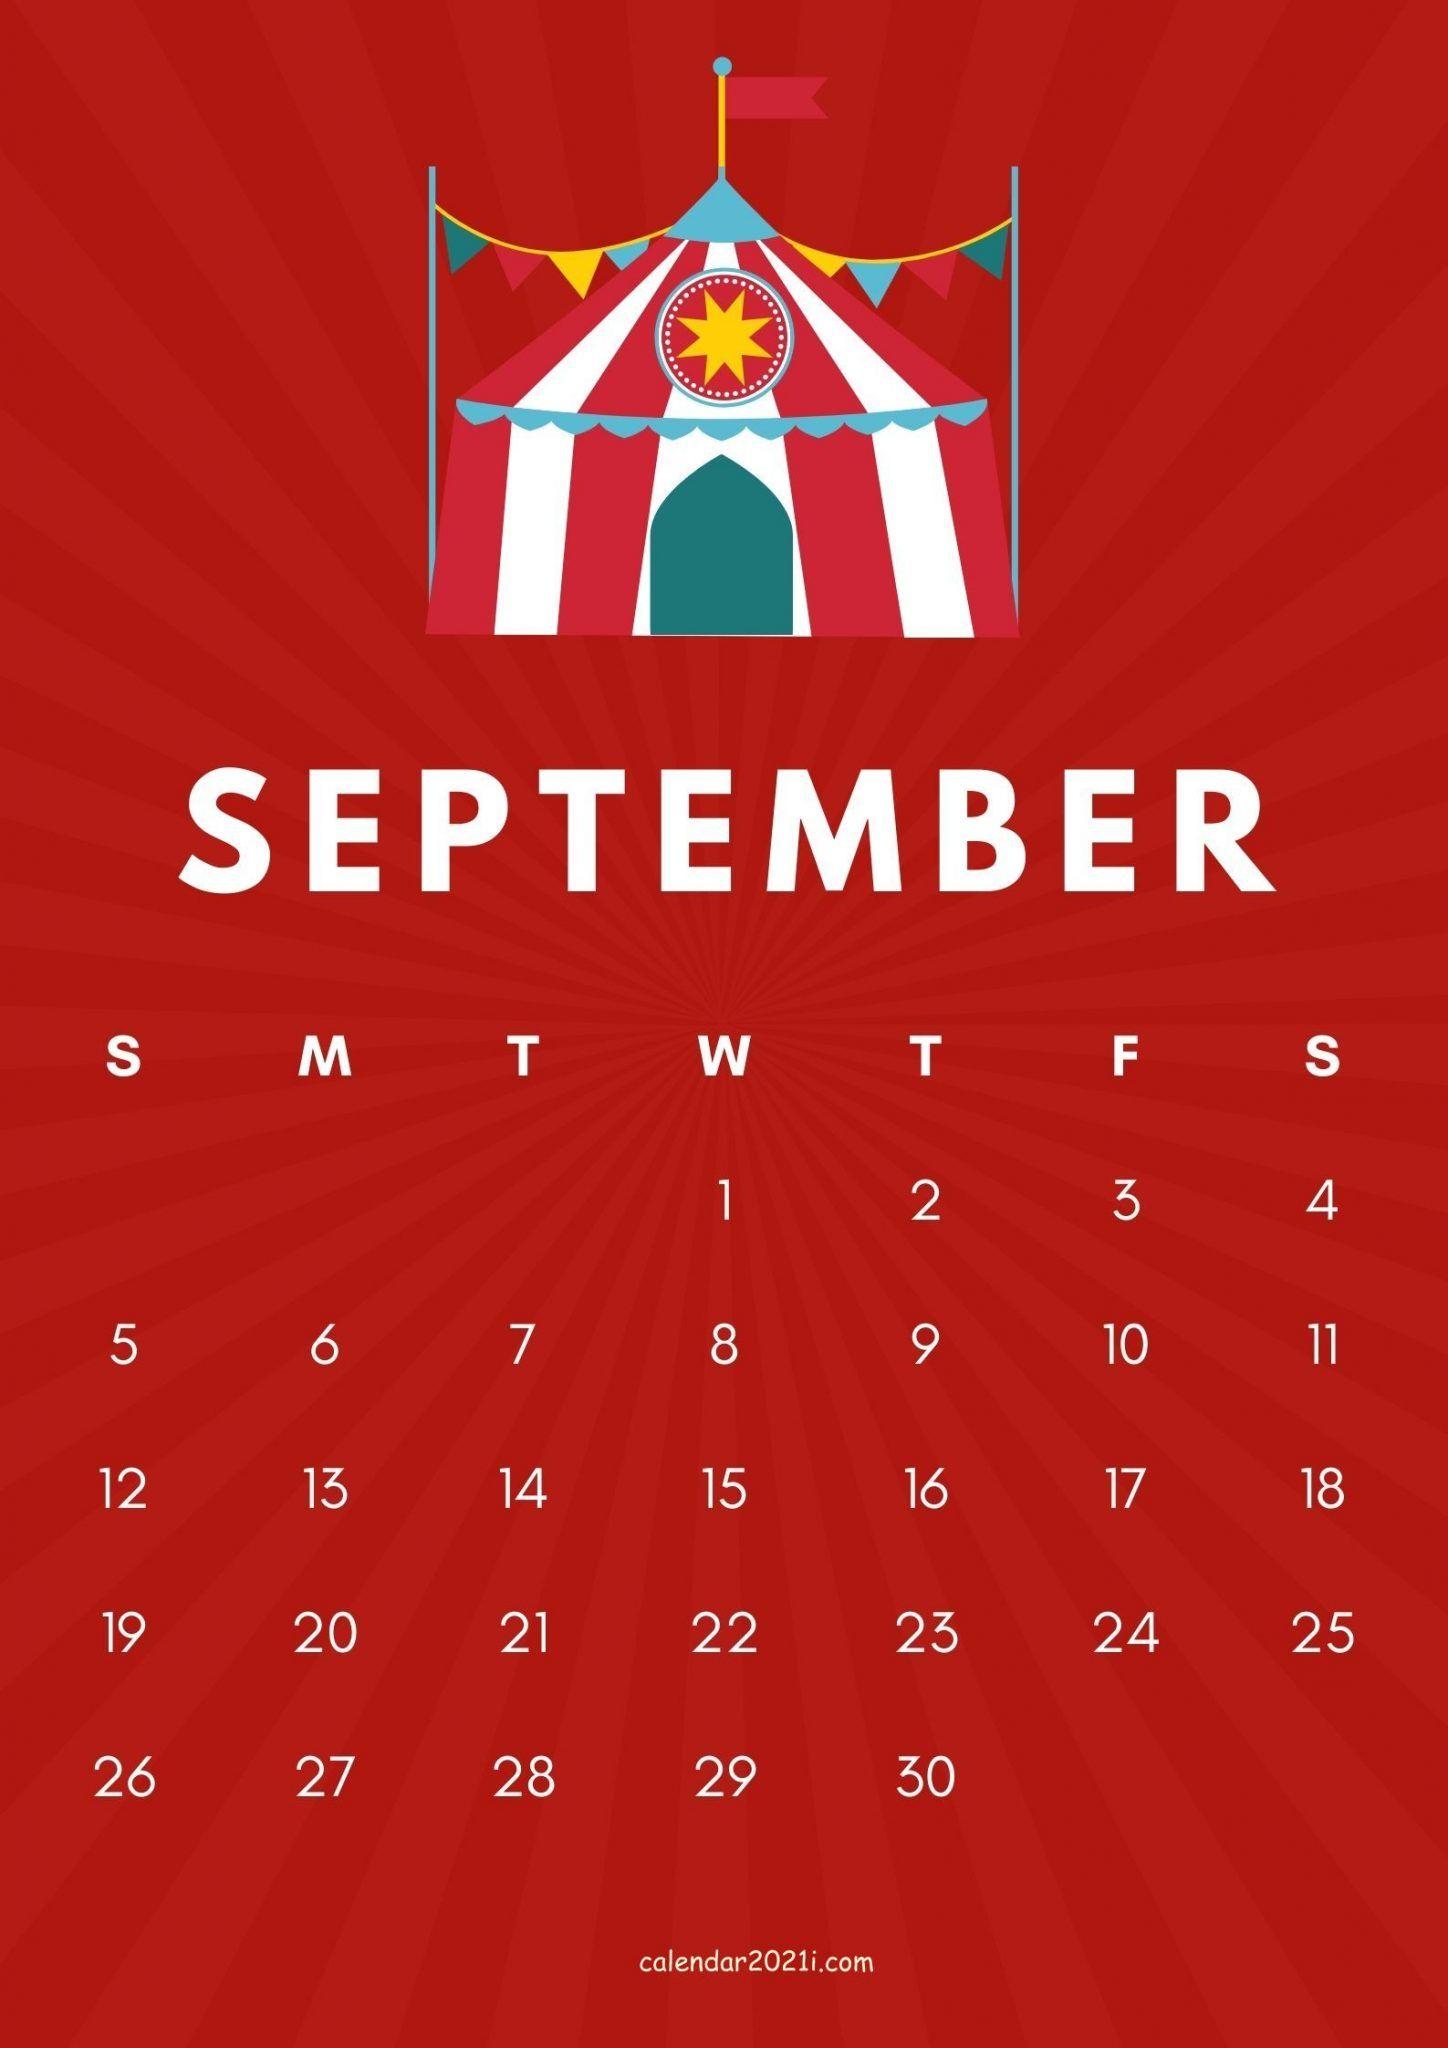 September 2021 Cute Calendar Design in 2020 Free